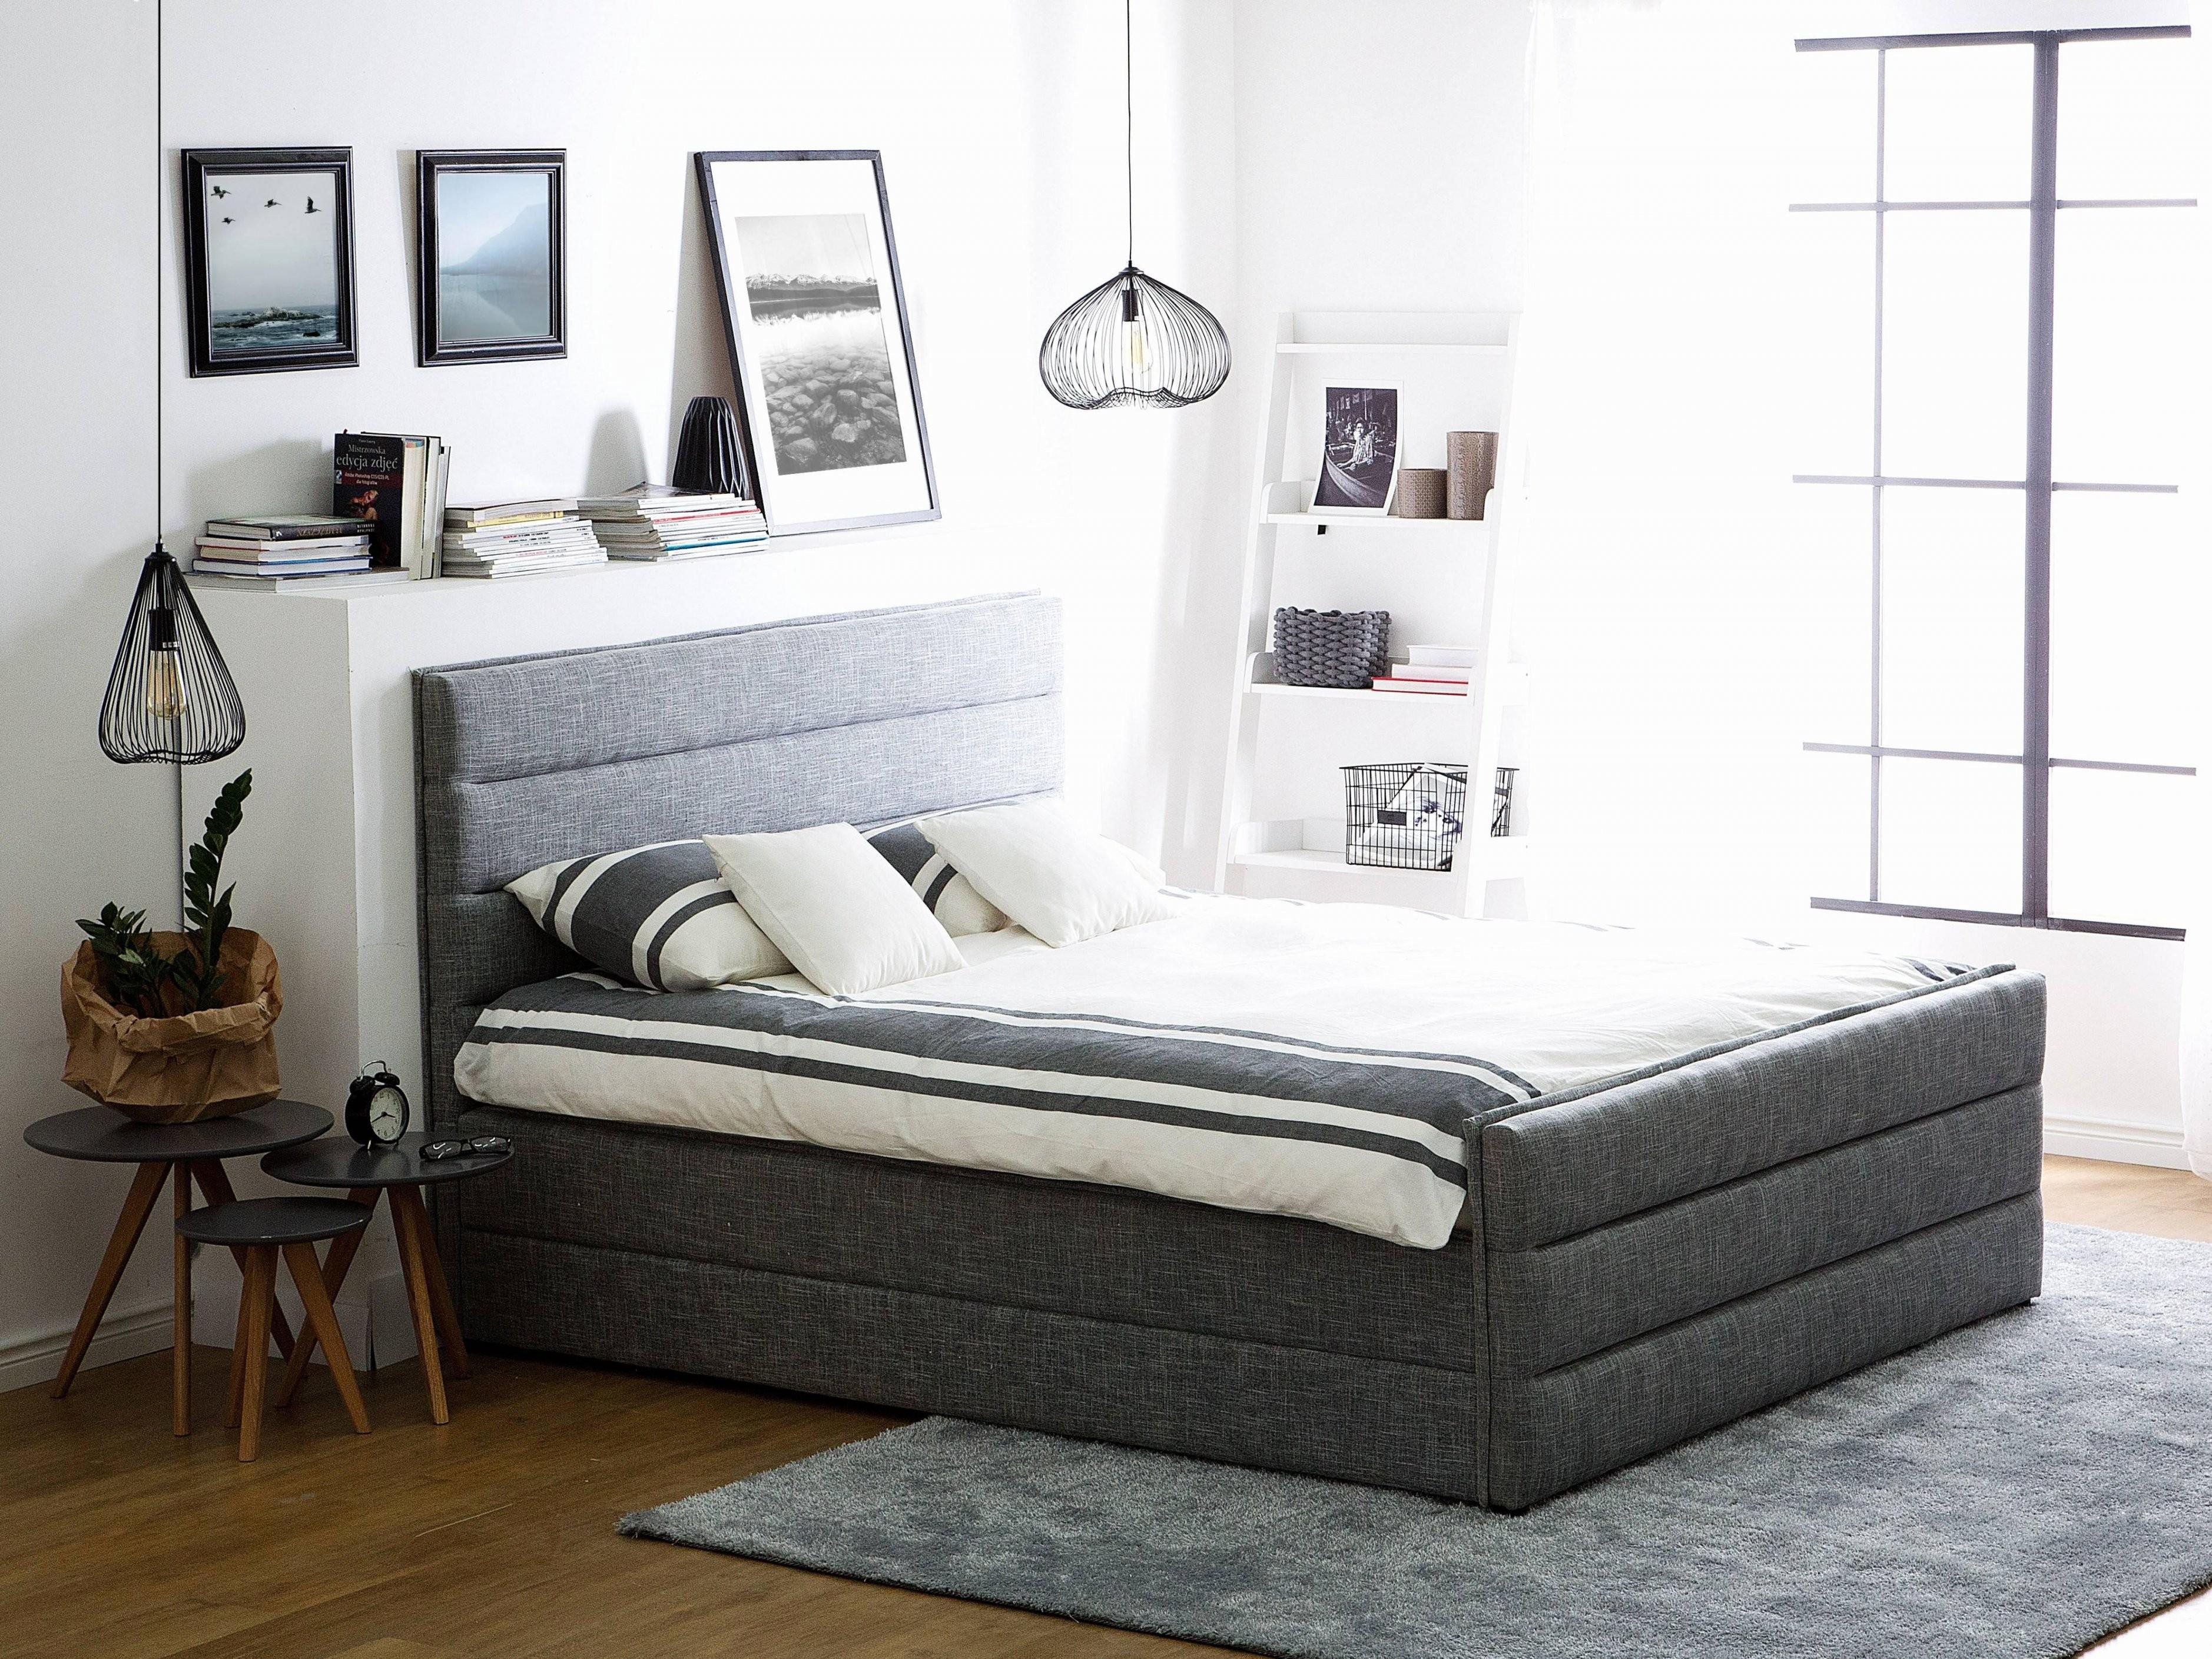 50 Elegant Bett Mit Led Beleuchtung 180×200  Huambodigital von Bett Mit Led Beleuchtung 180X200 Photo